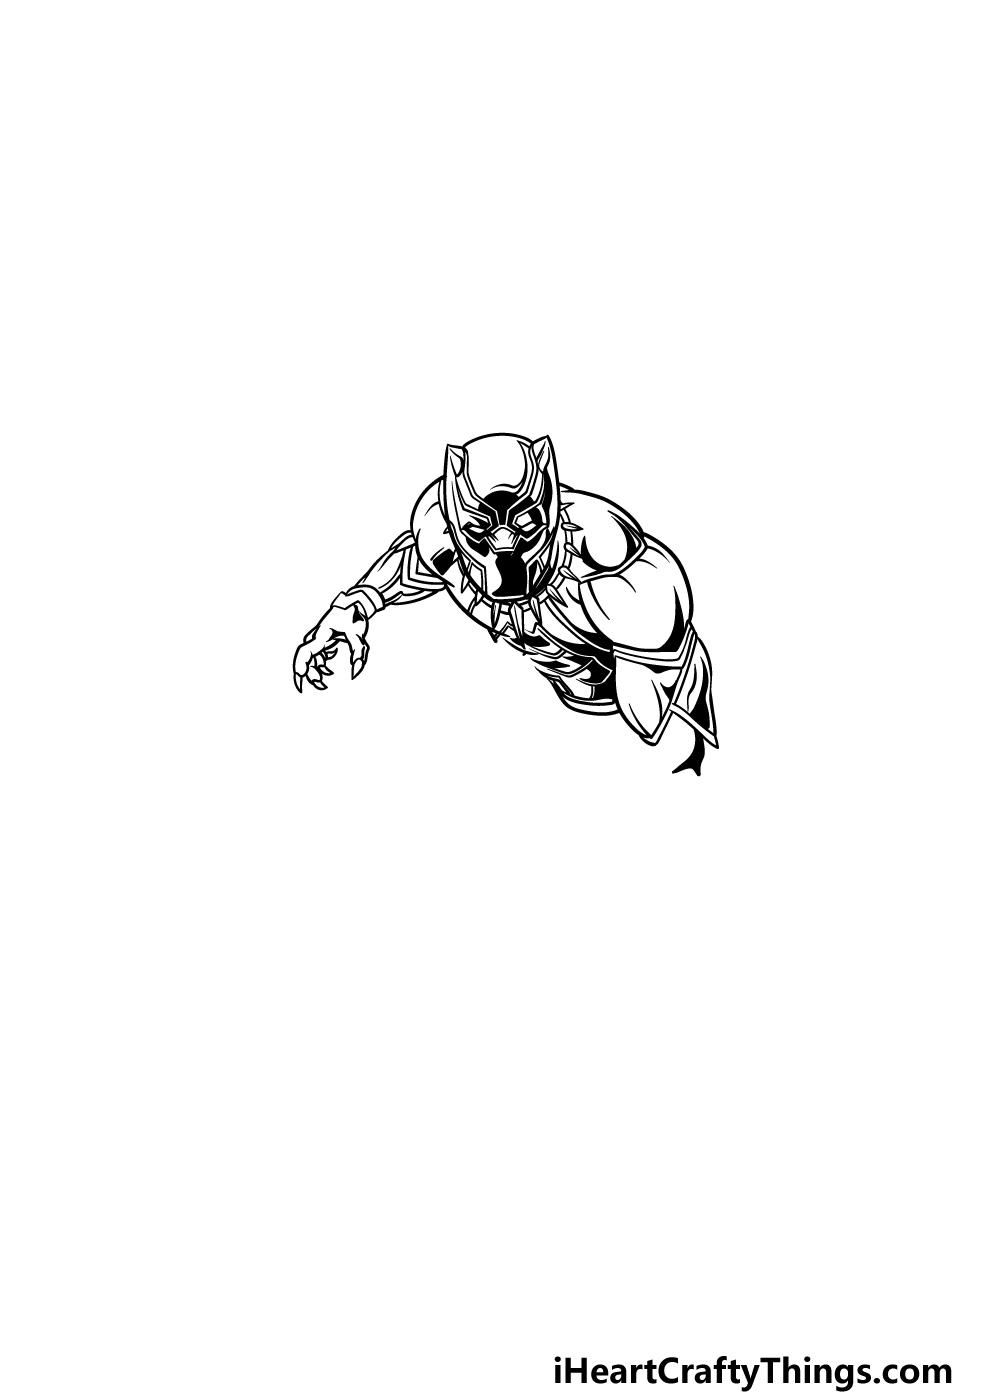 drawing Black Panther step 2